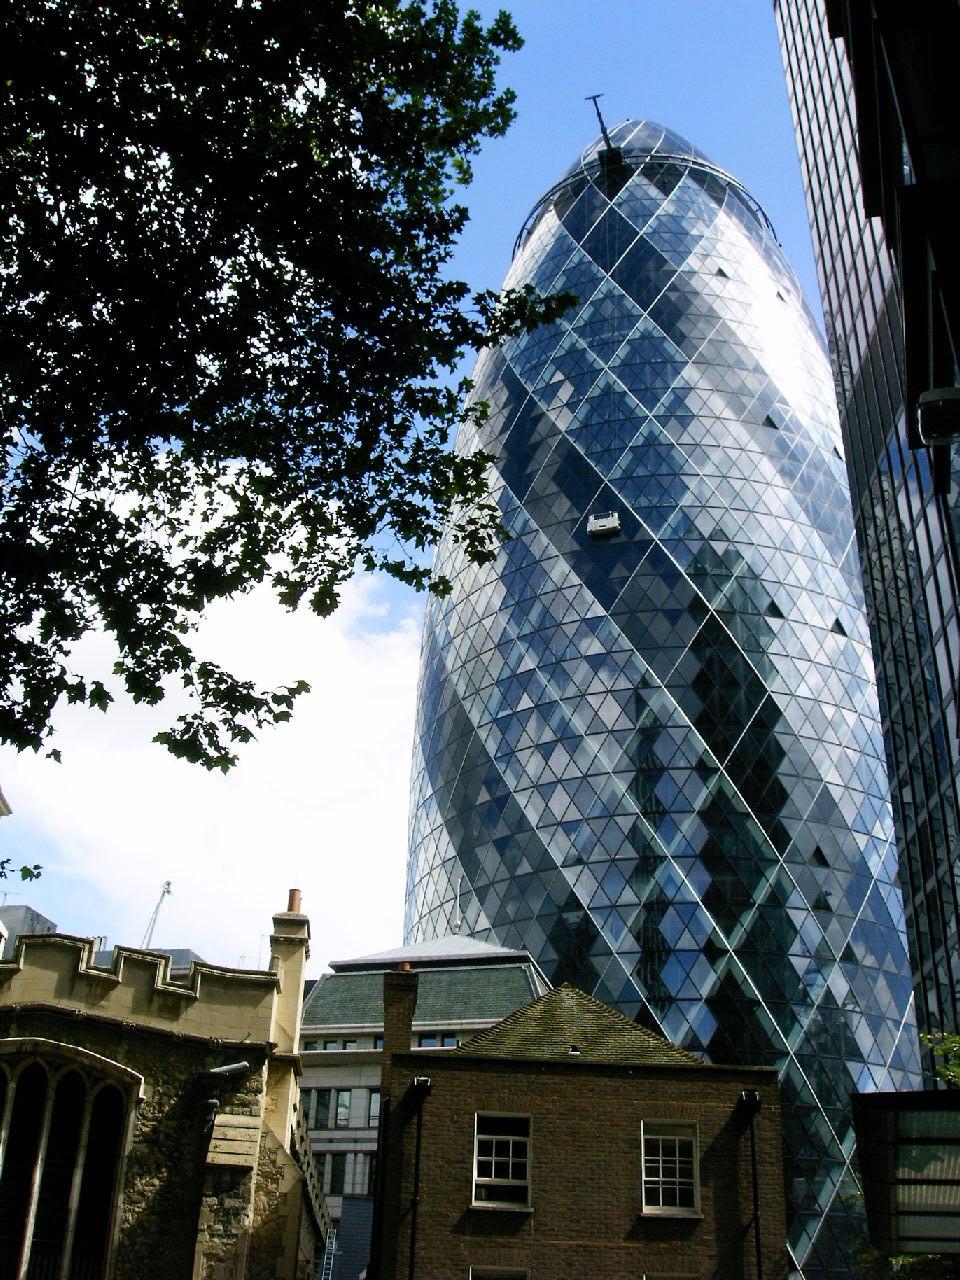 The London's Gherkin